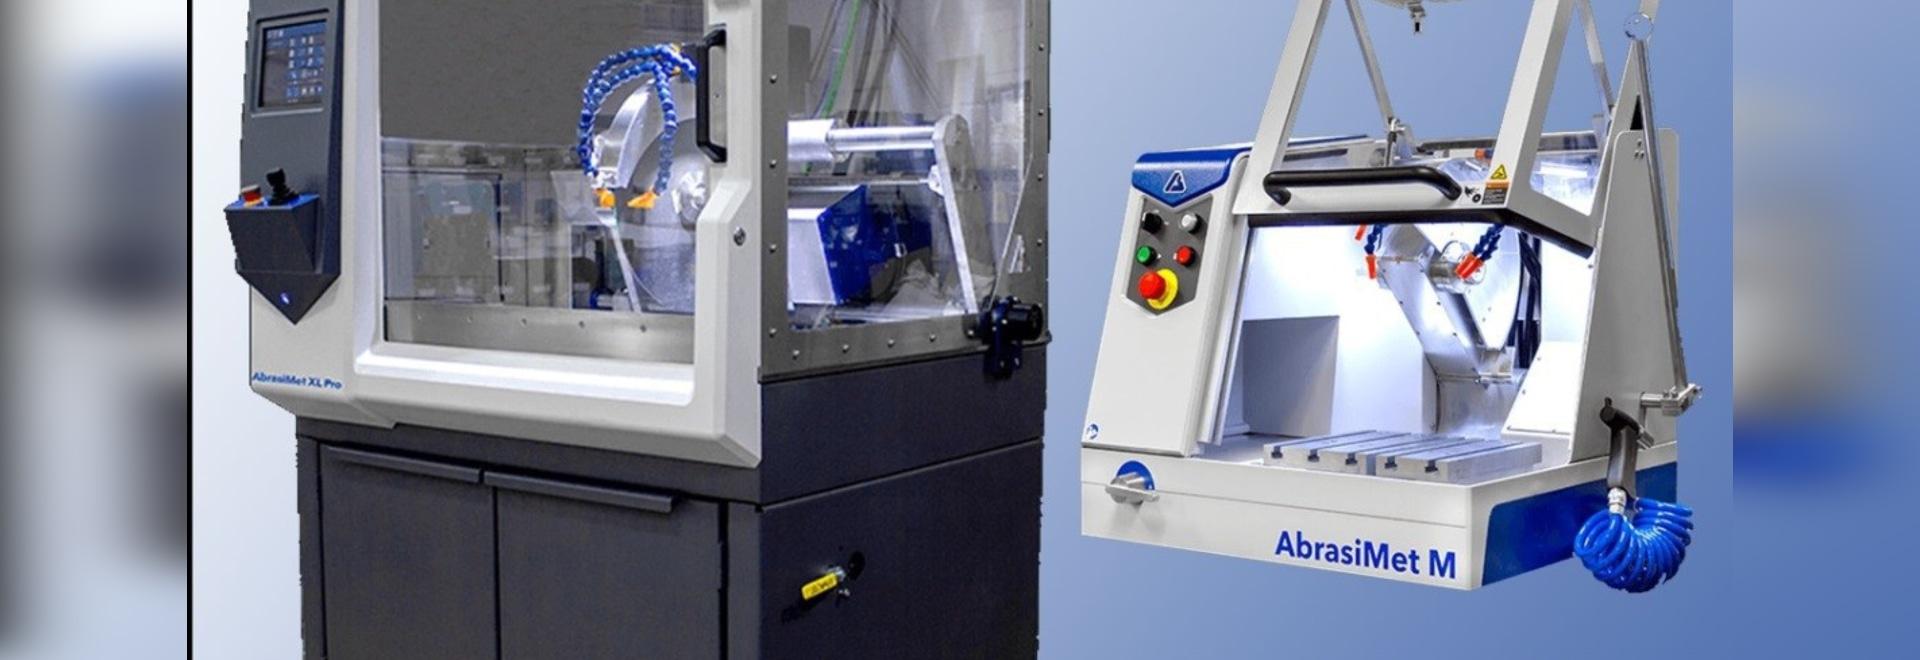 AbrasiMet M Medium Abrasive Cutter Introduced by Buehler